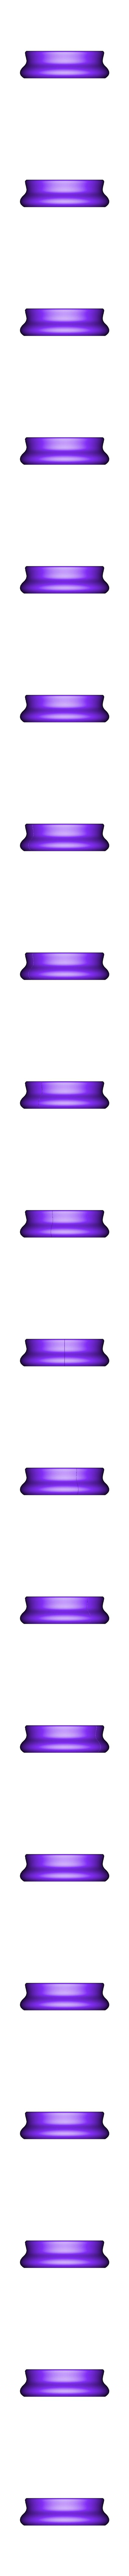 Base.stl Download OBJ file Mickey Christmas night light lithophane • 3D printing model, Ludo3D